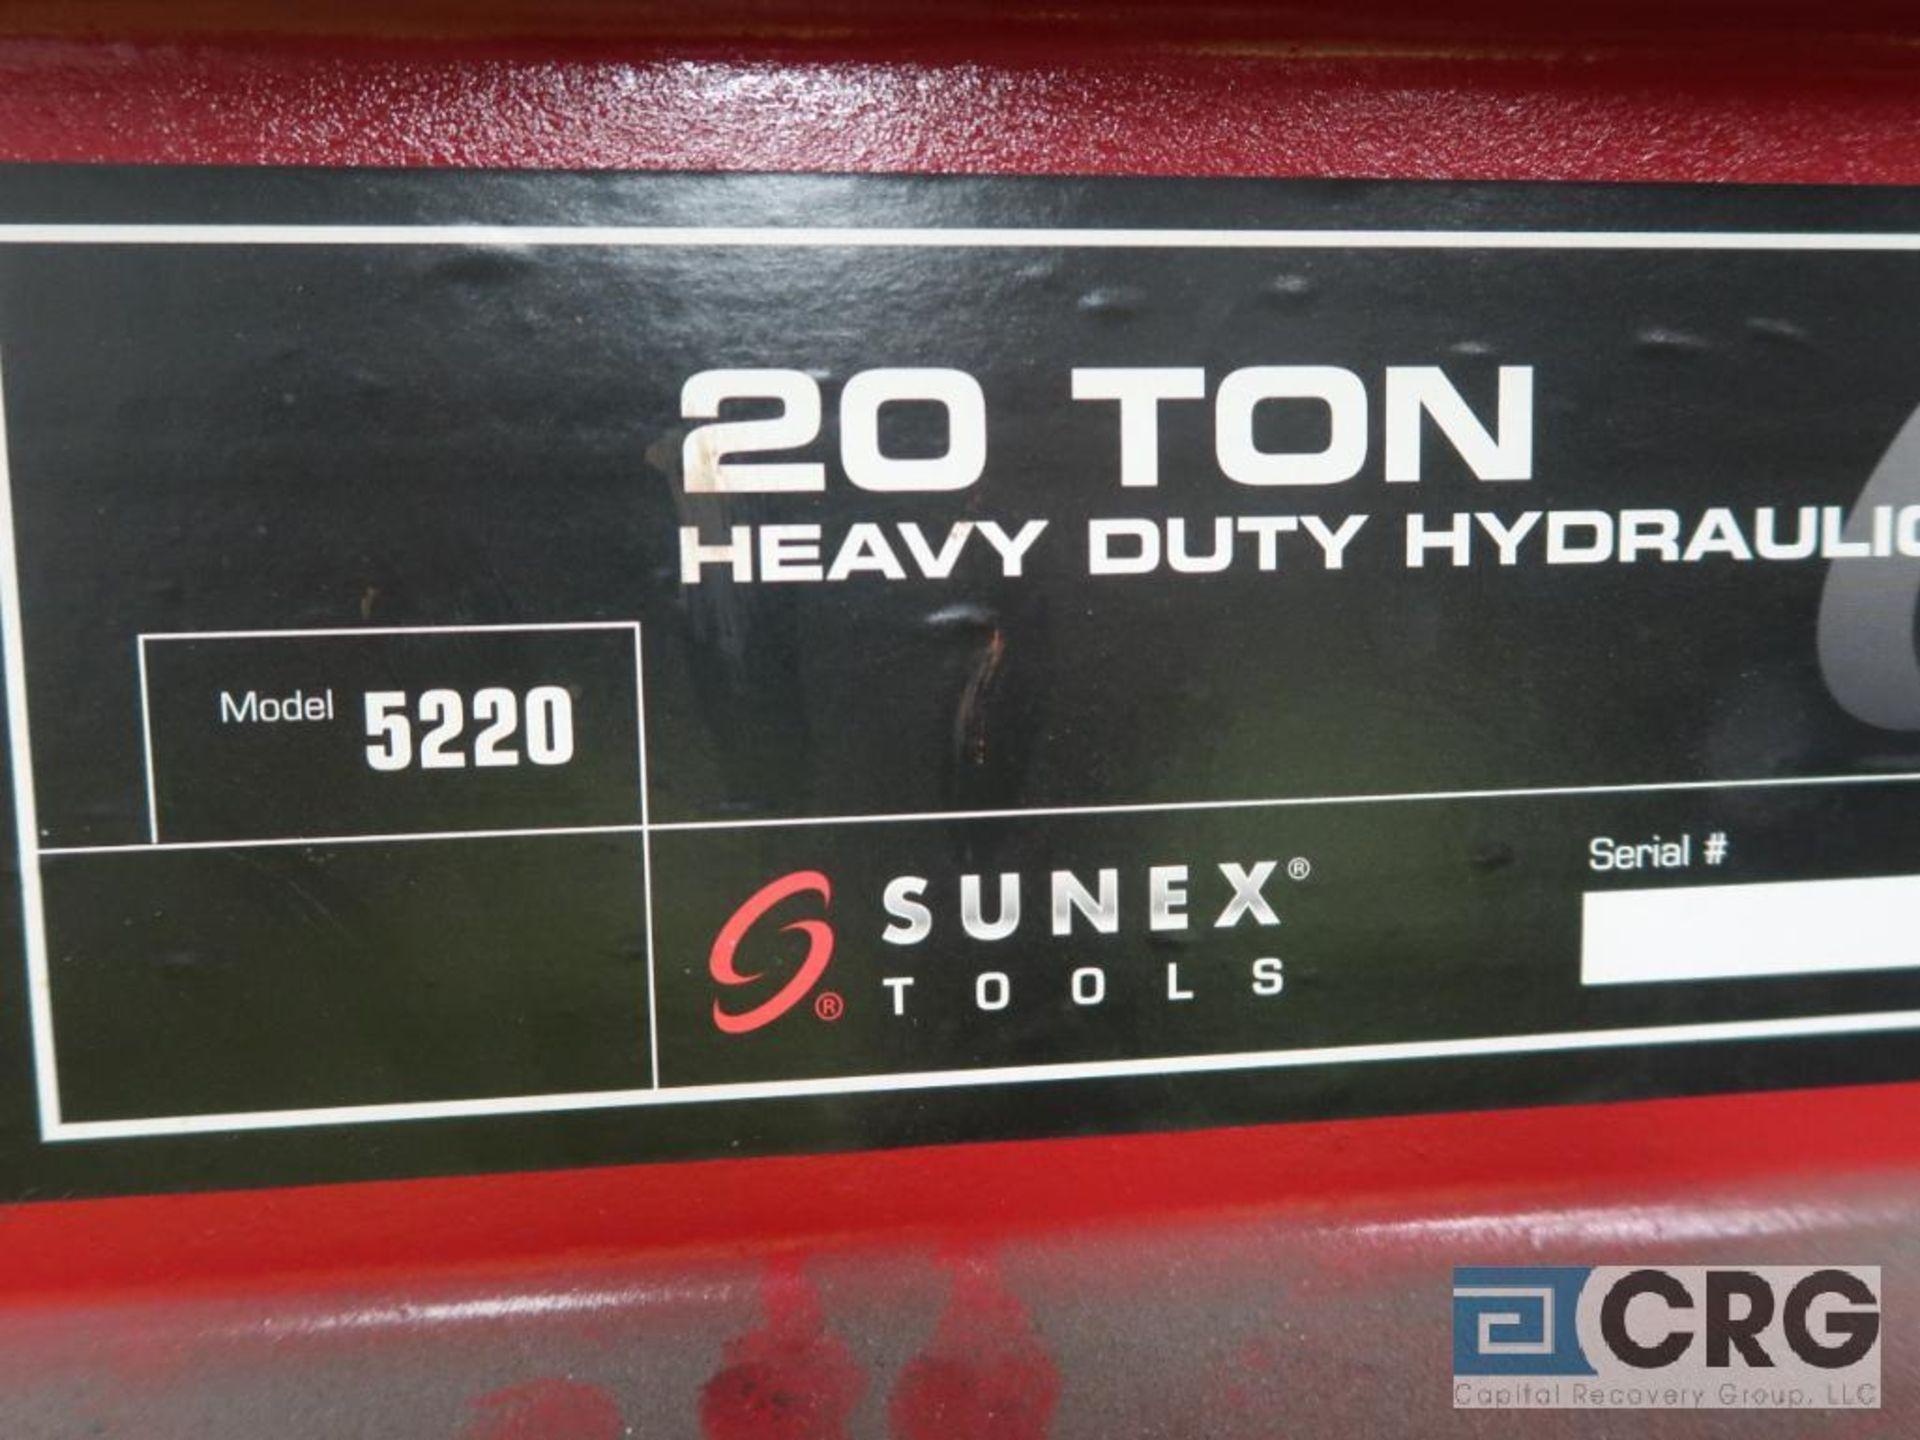 Sunex 5220 hydraulic press, 20 ton cap. (Basement Stores) - Image 2 of 2